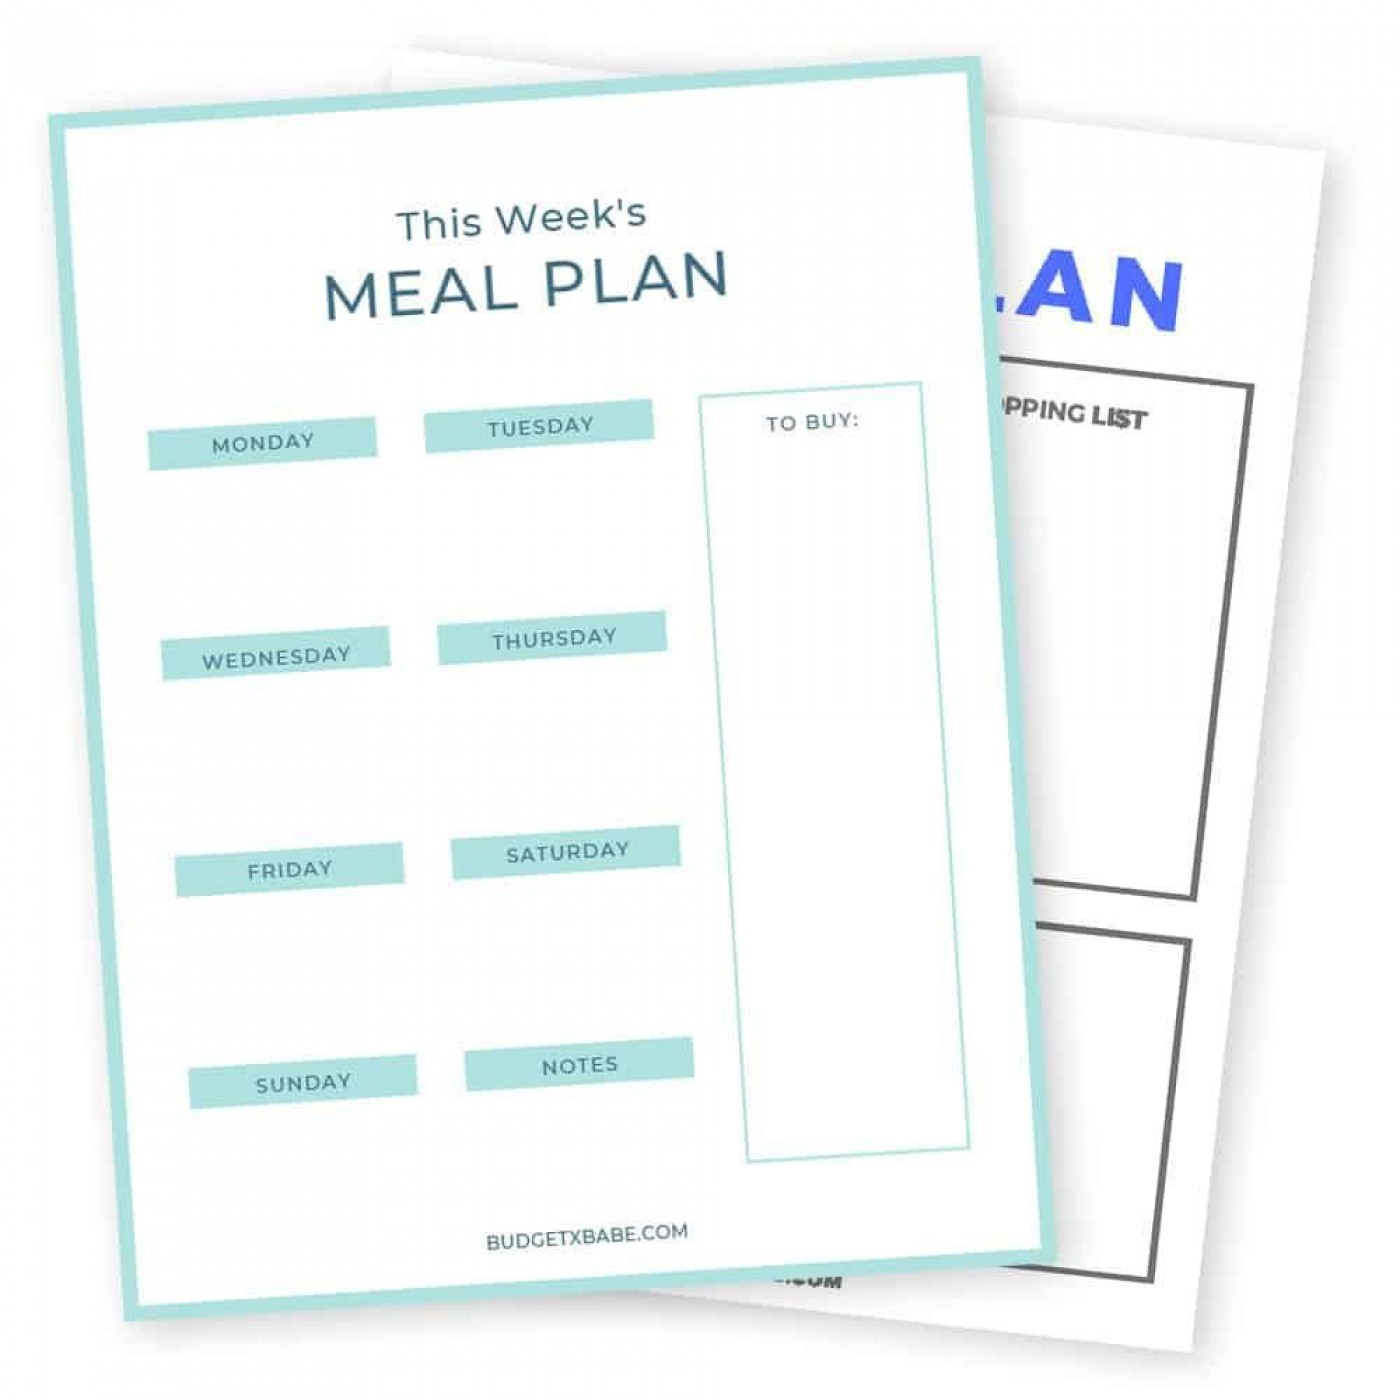 009 Frightening Meal Plan Printable Pdf Example  Worksheet Downloadable Template Sheet1400